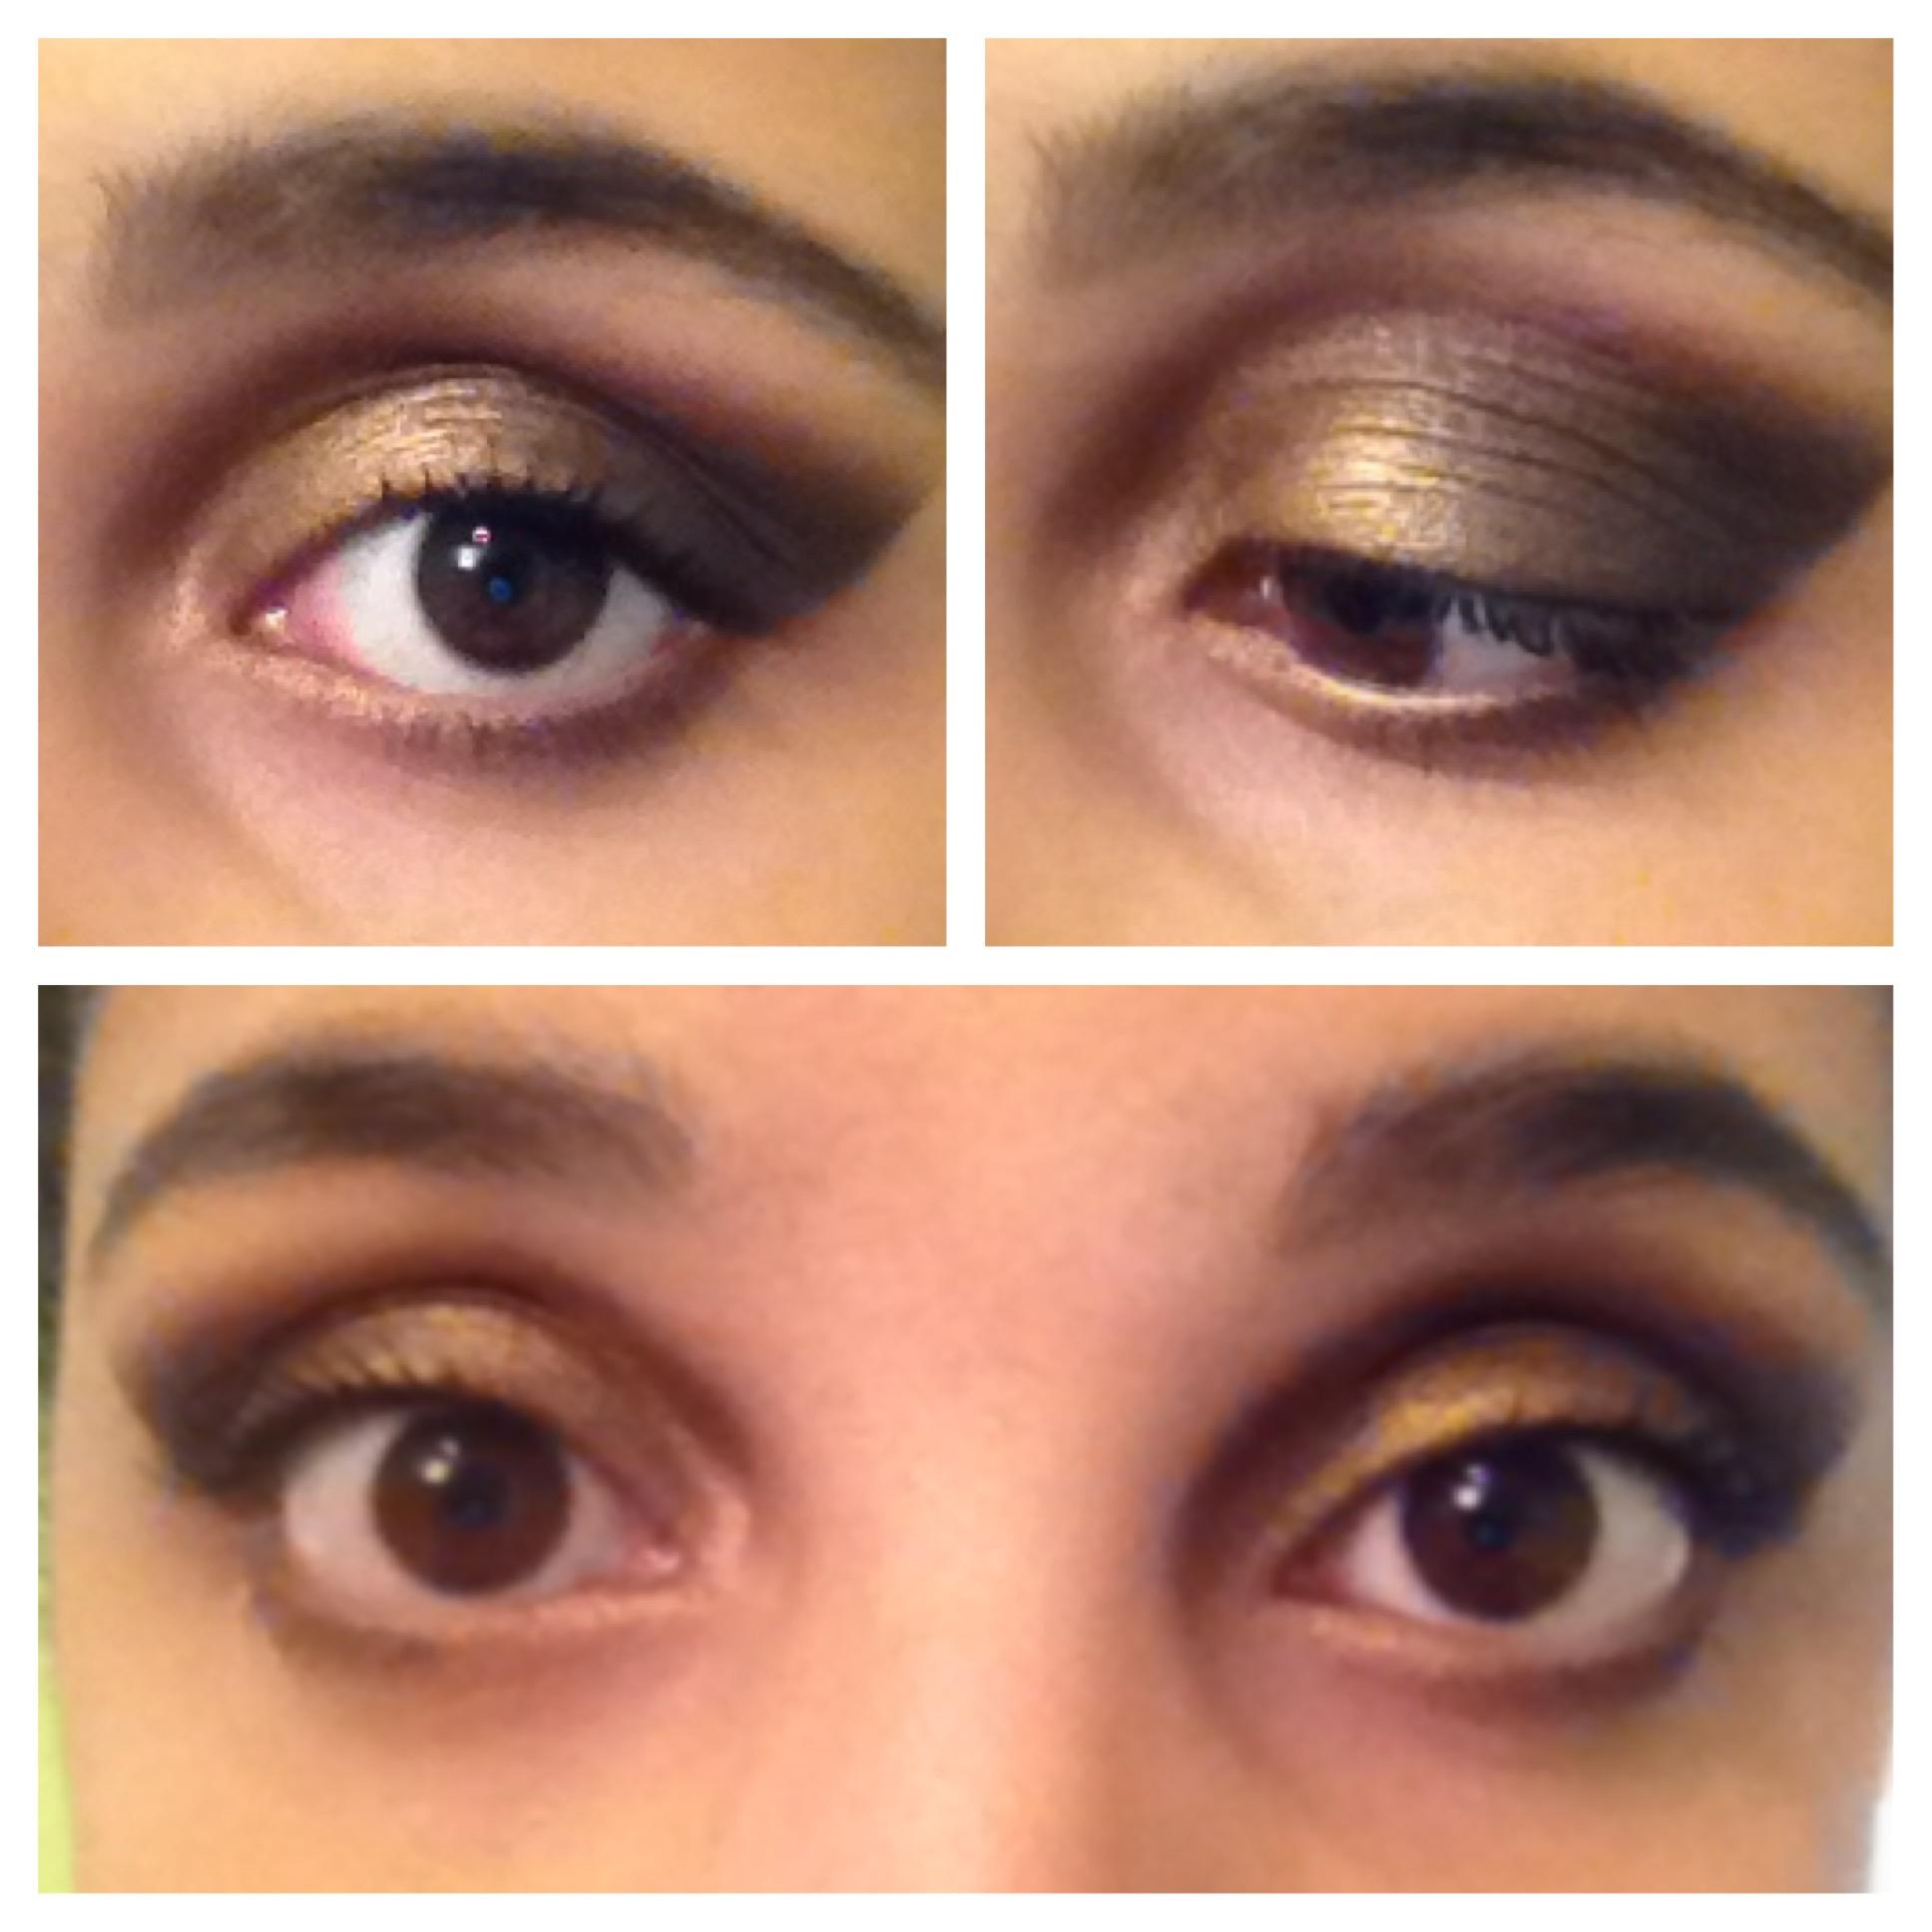 morphe eye makeup looks. dramatic eye look using morphe brushes 35w palette! makeup looks e